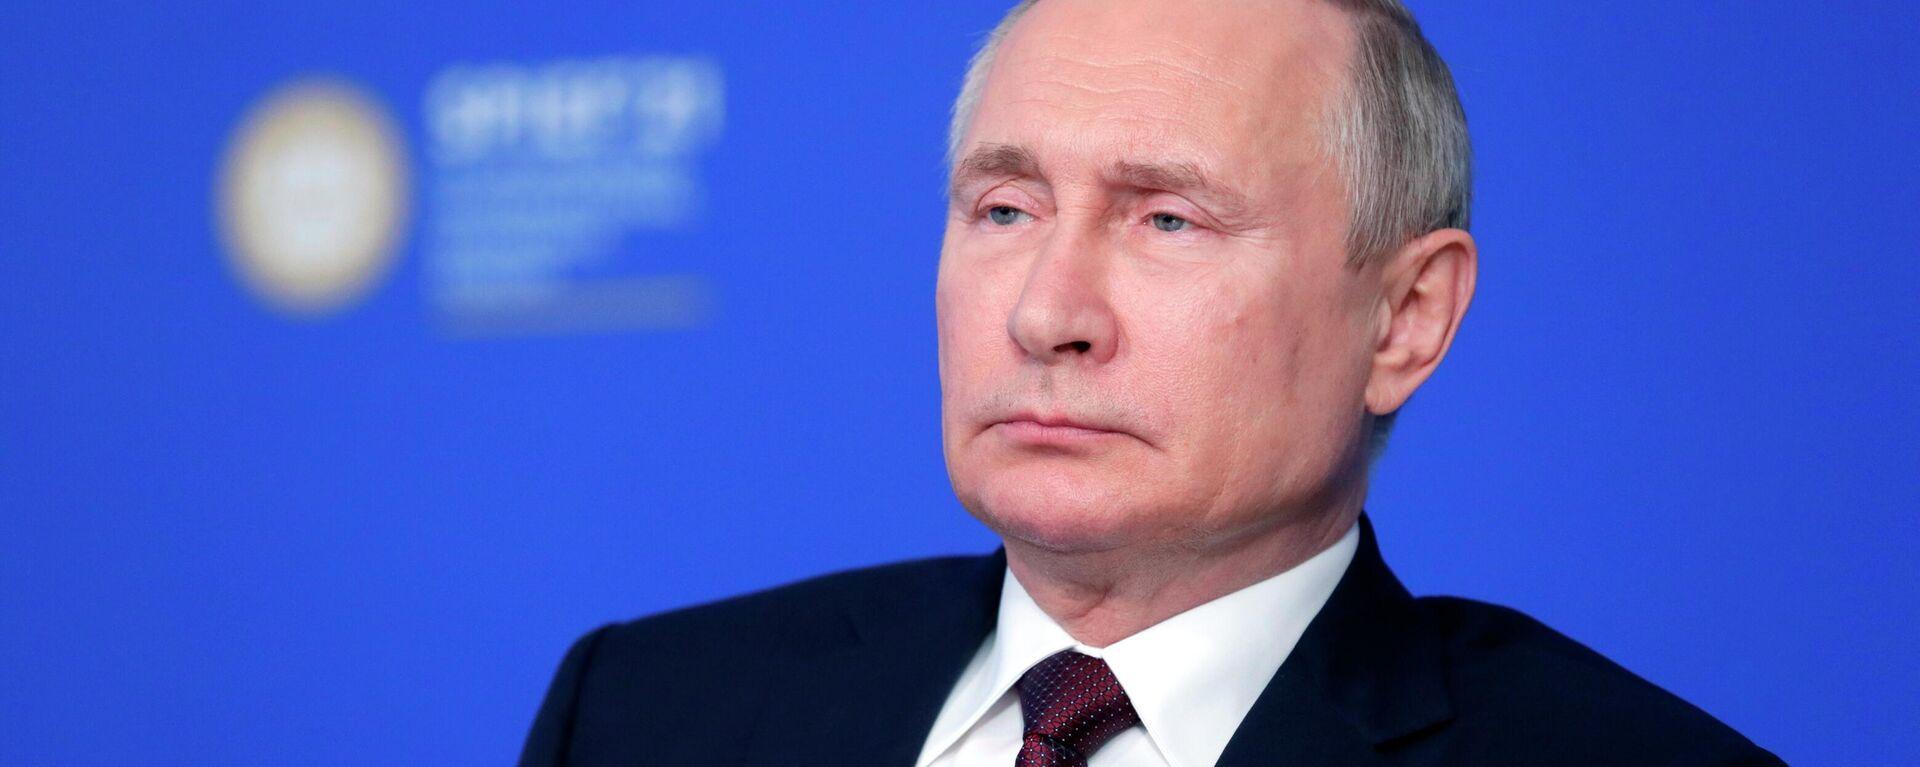 Vladímir Putin, presidente de Rusia - Sputnik Mundo, 1920, 05.06.2021